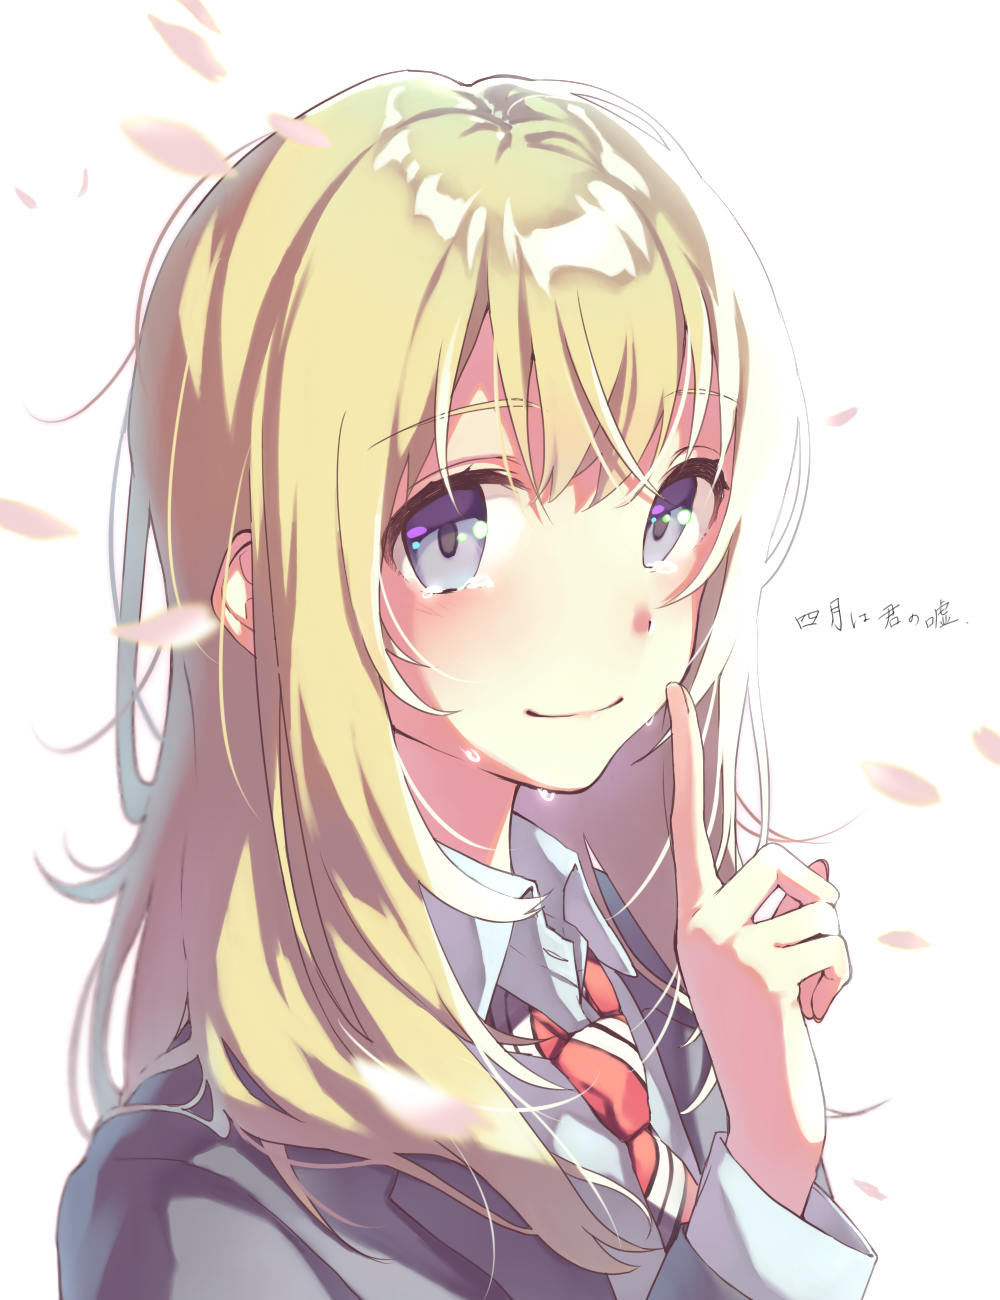 Miyazono kaori beautiful anime girl i love anime me me me anime